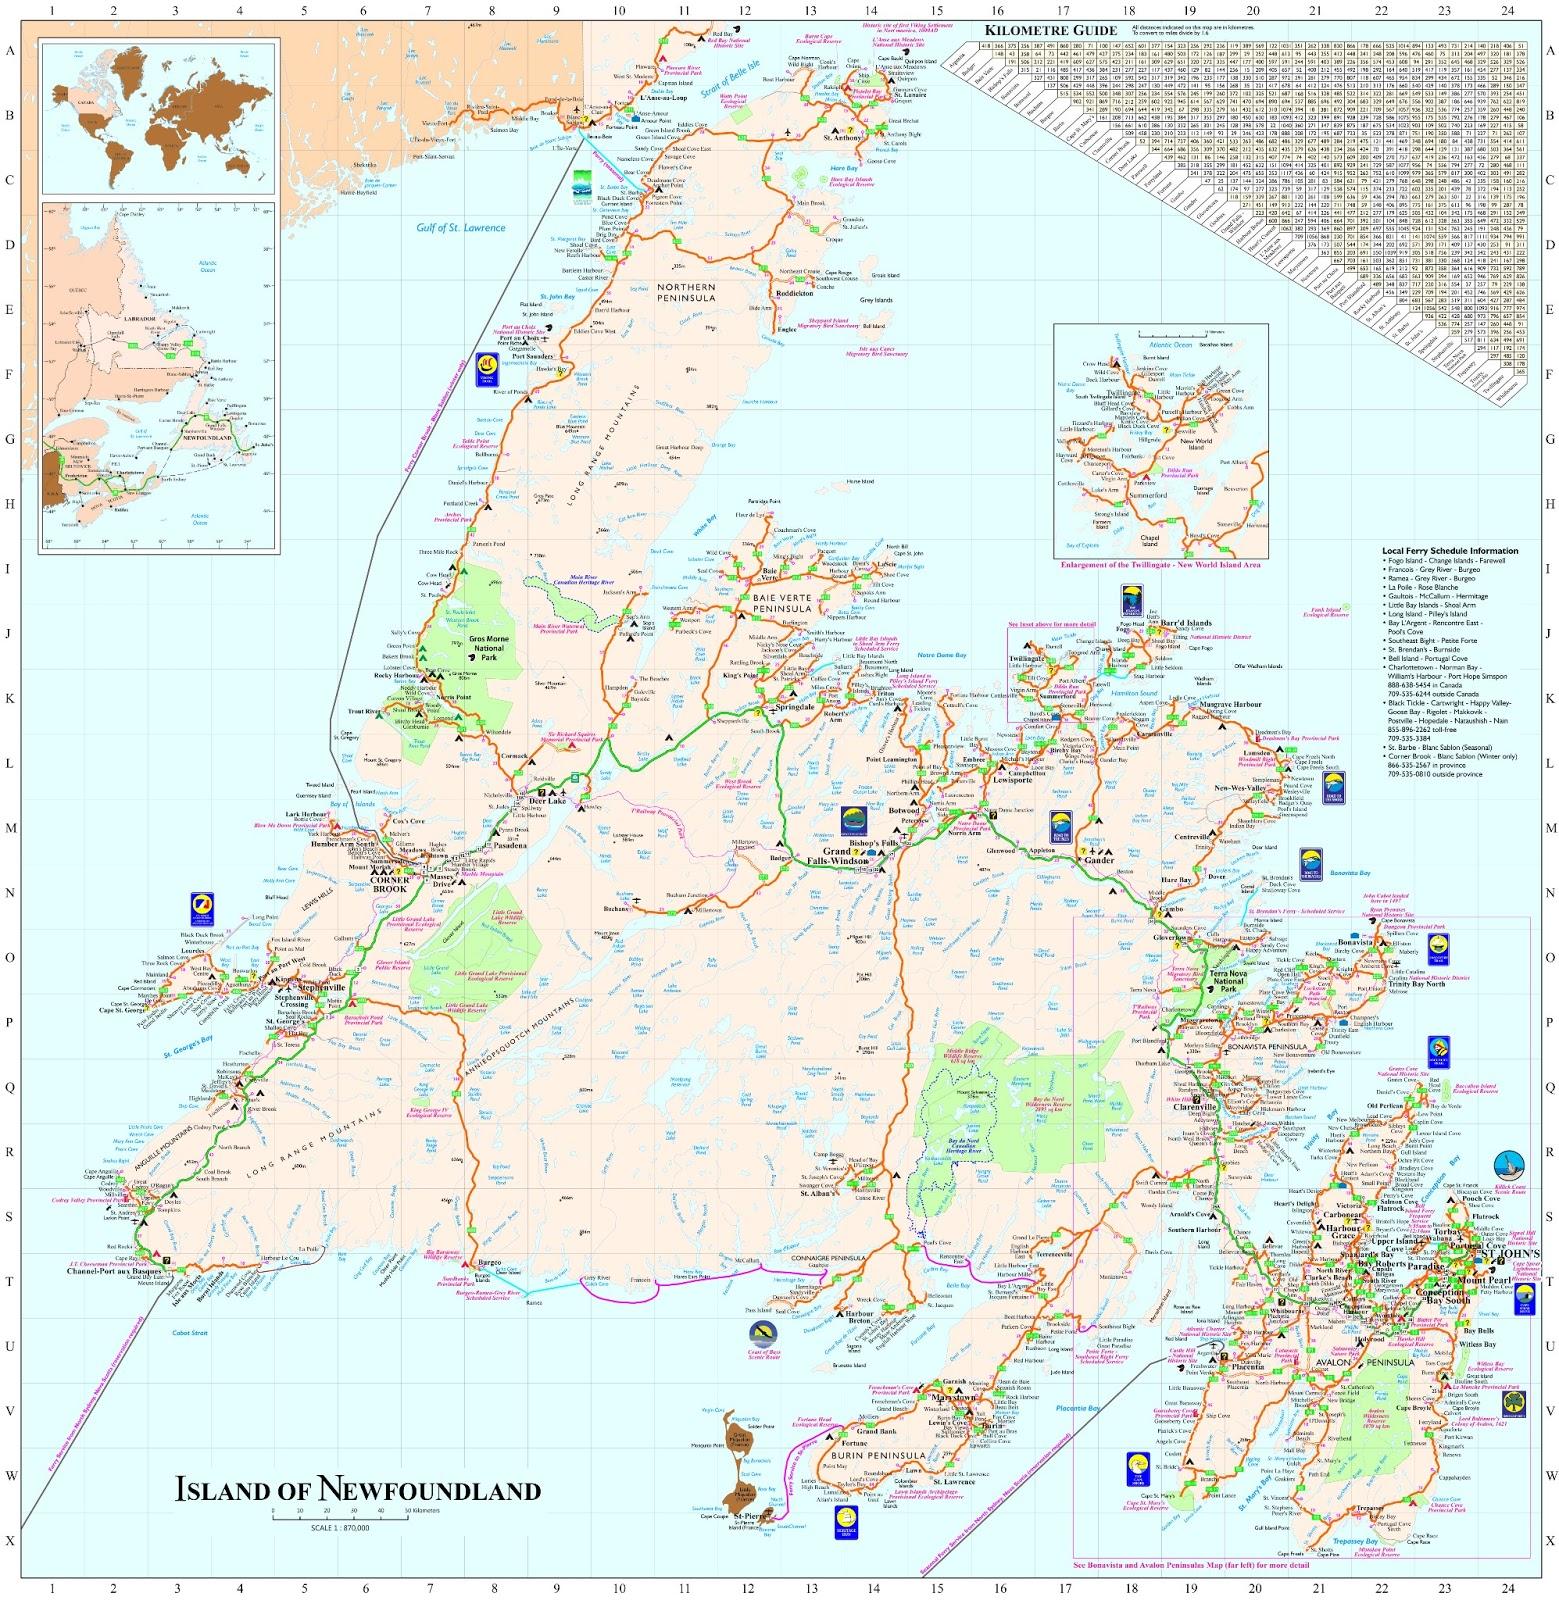 Geomapix Gateway Blog Spot: Newfoundland & Labrador ...